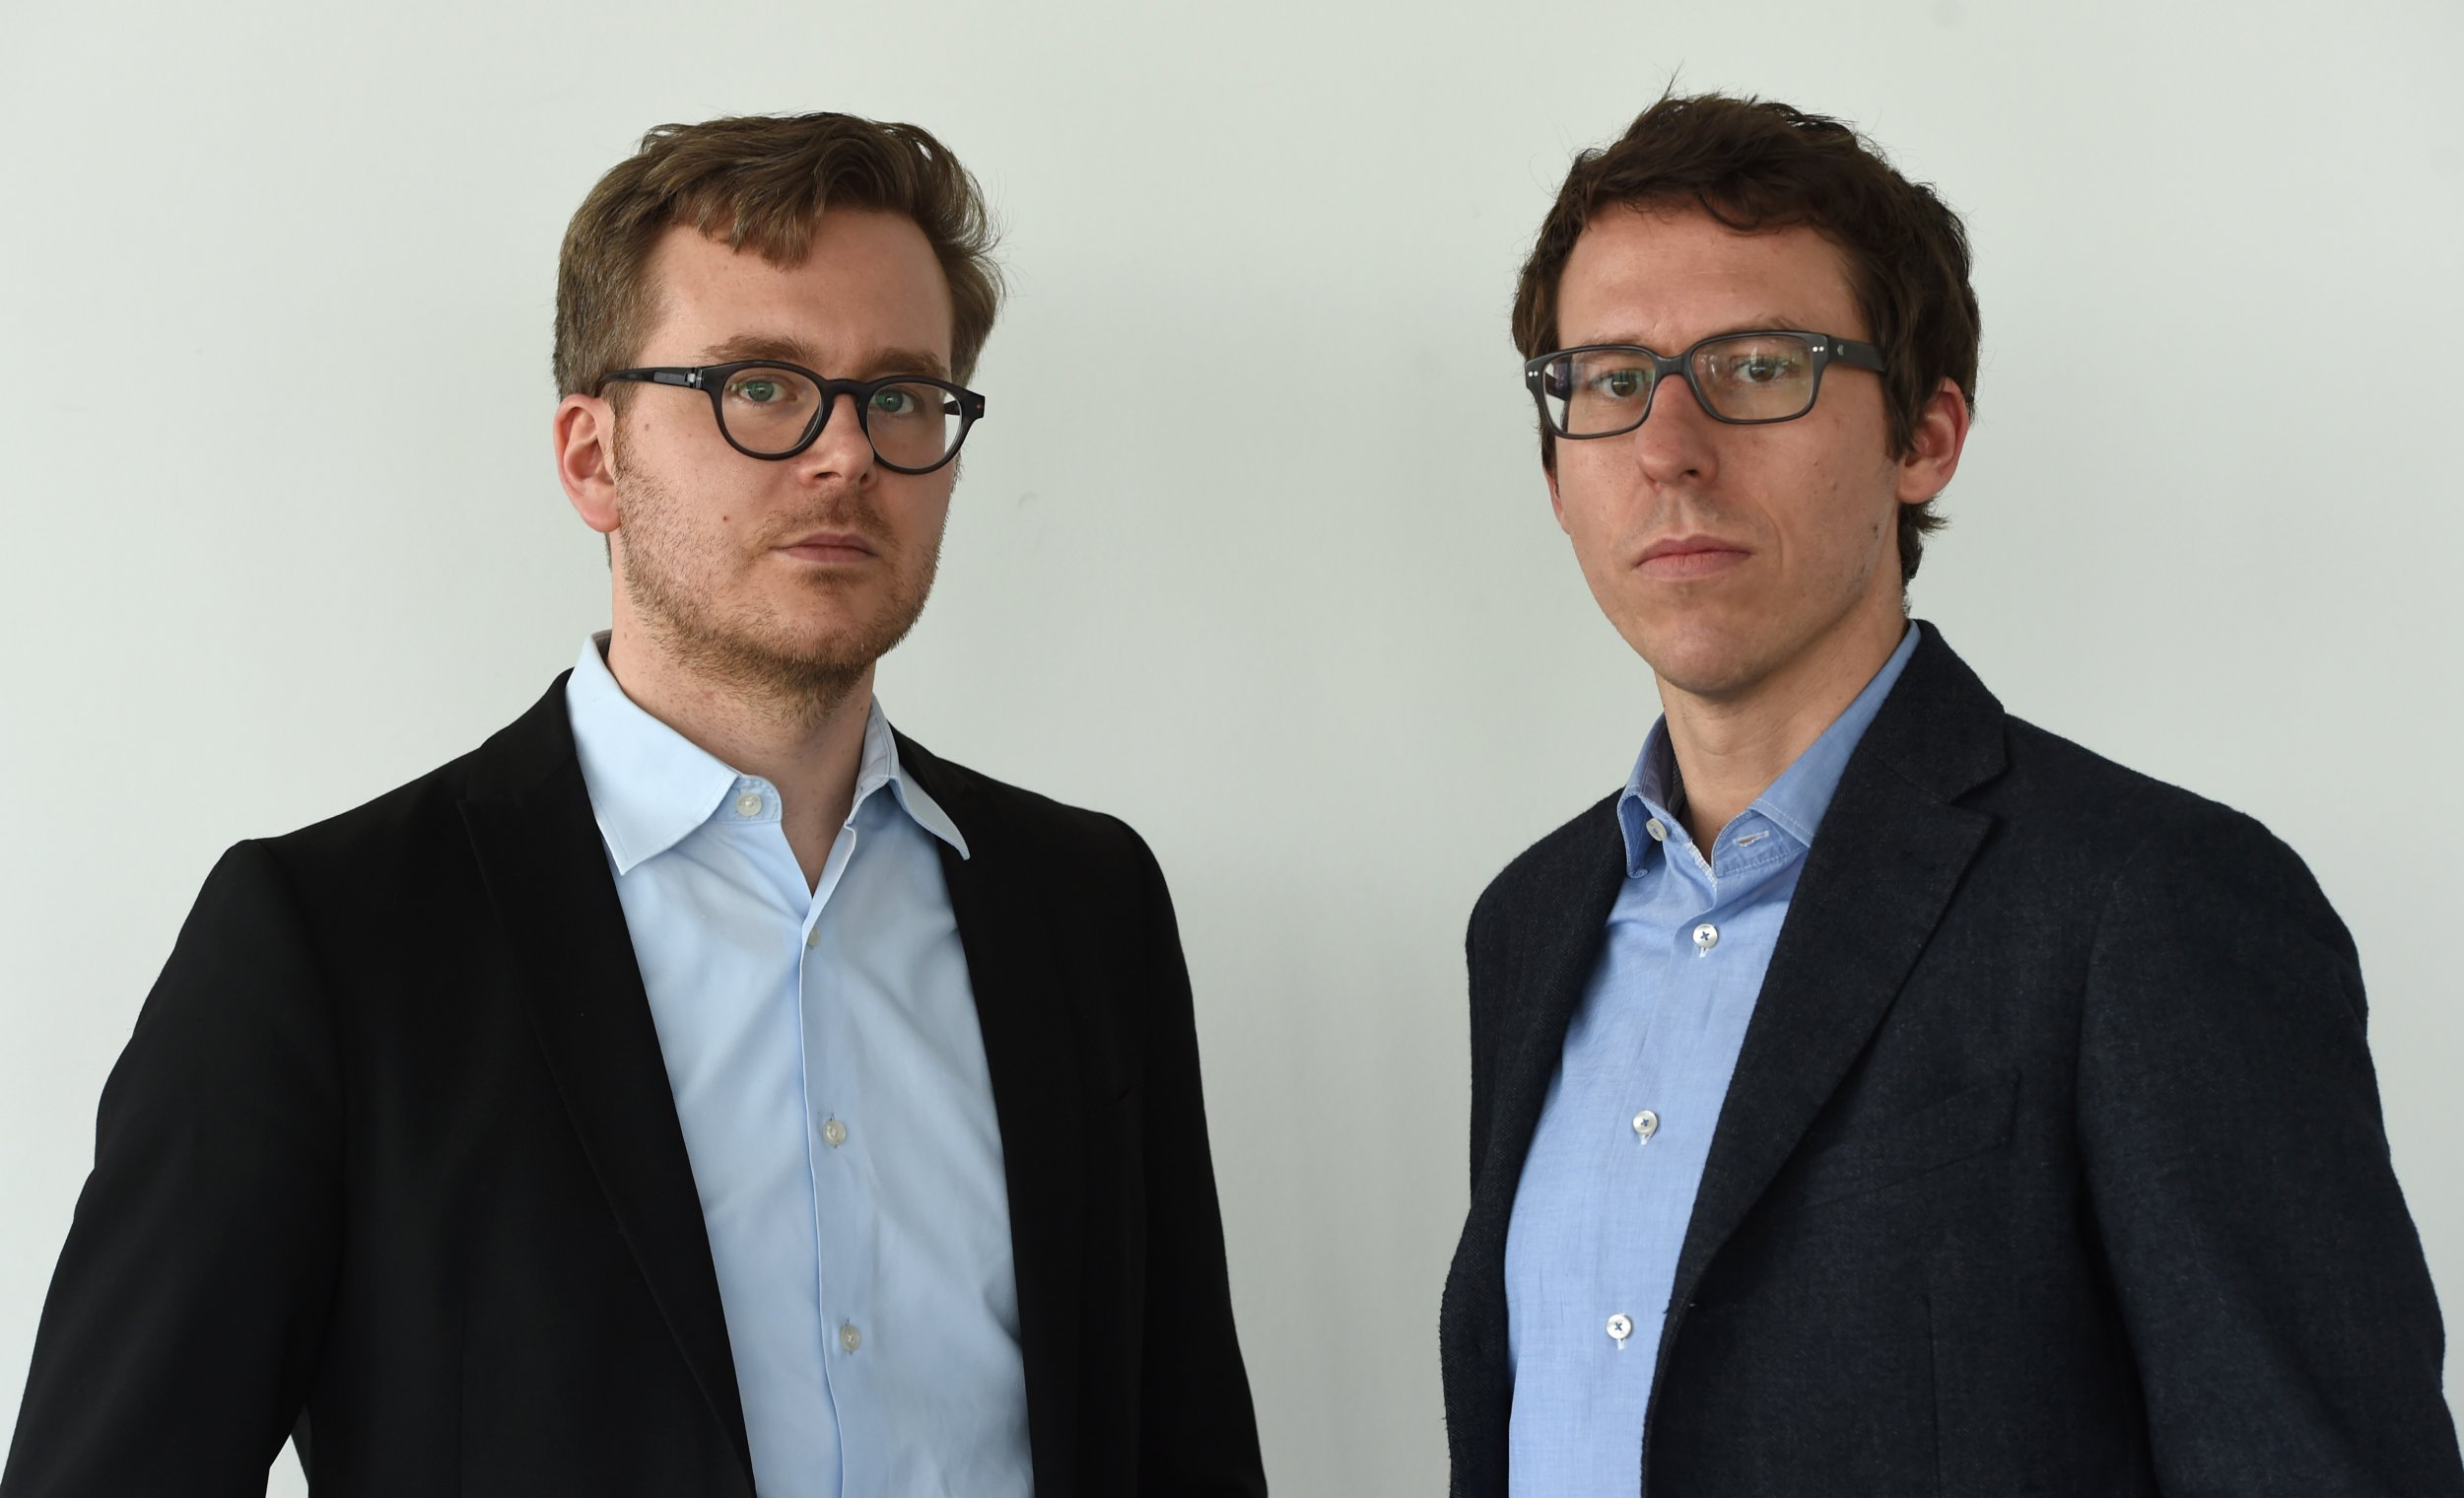 Frederik Obermaier (L) and Bastian Obermayer